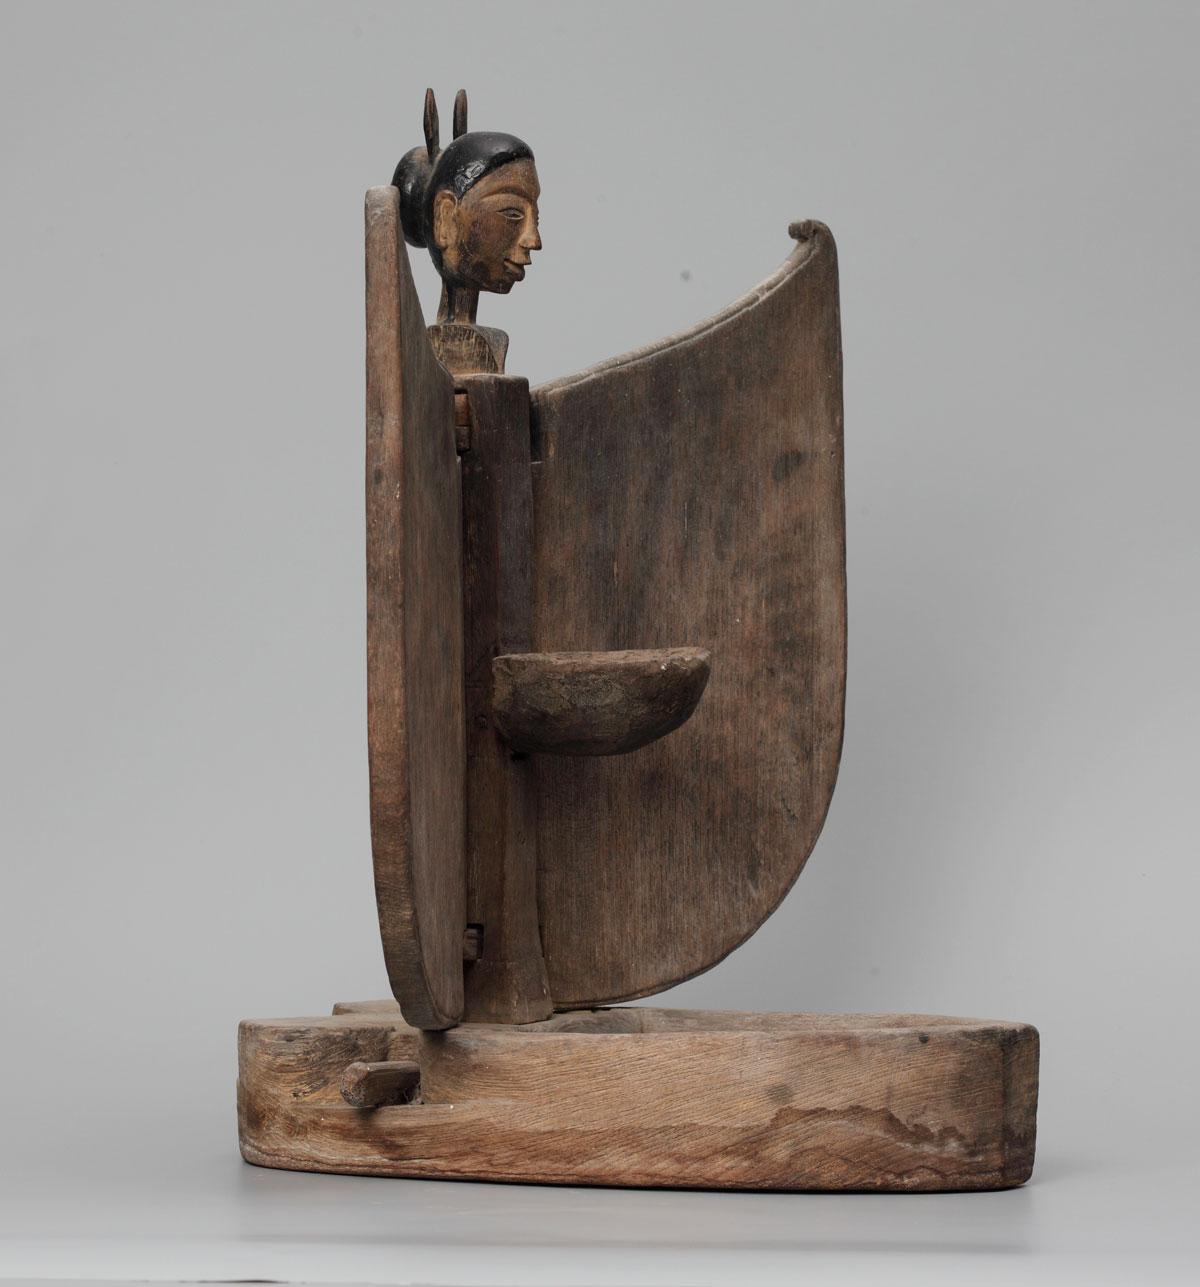 Jodog Sri Komang Ary Indonesian Arts